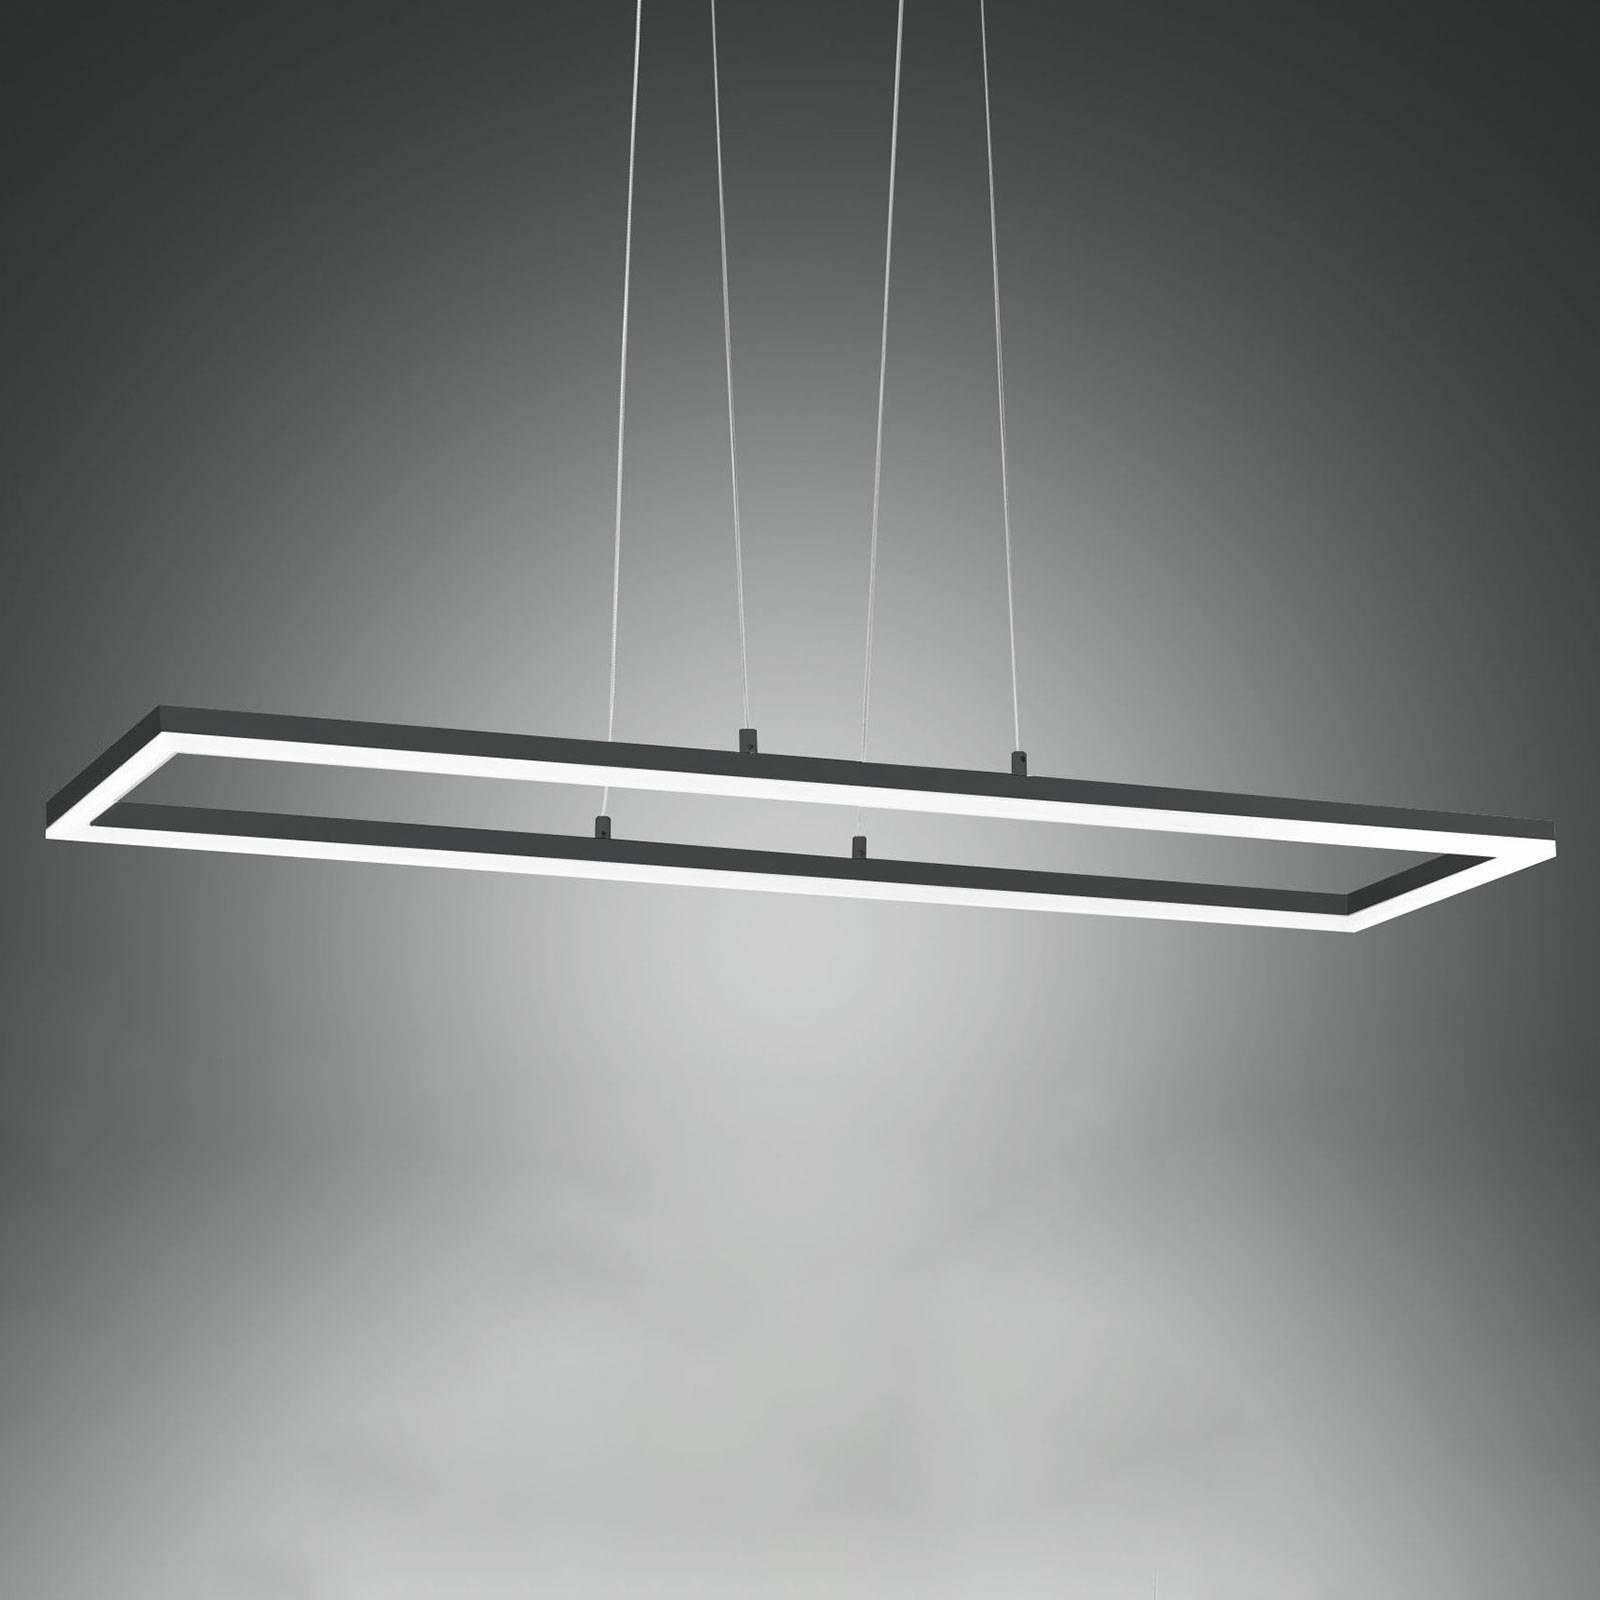 LED-riippuvalaisin Bard, 92x32 cm, antrasiitti